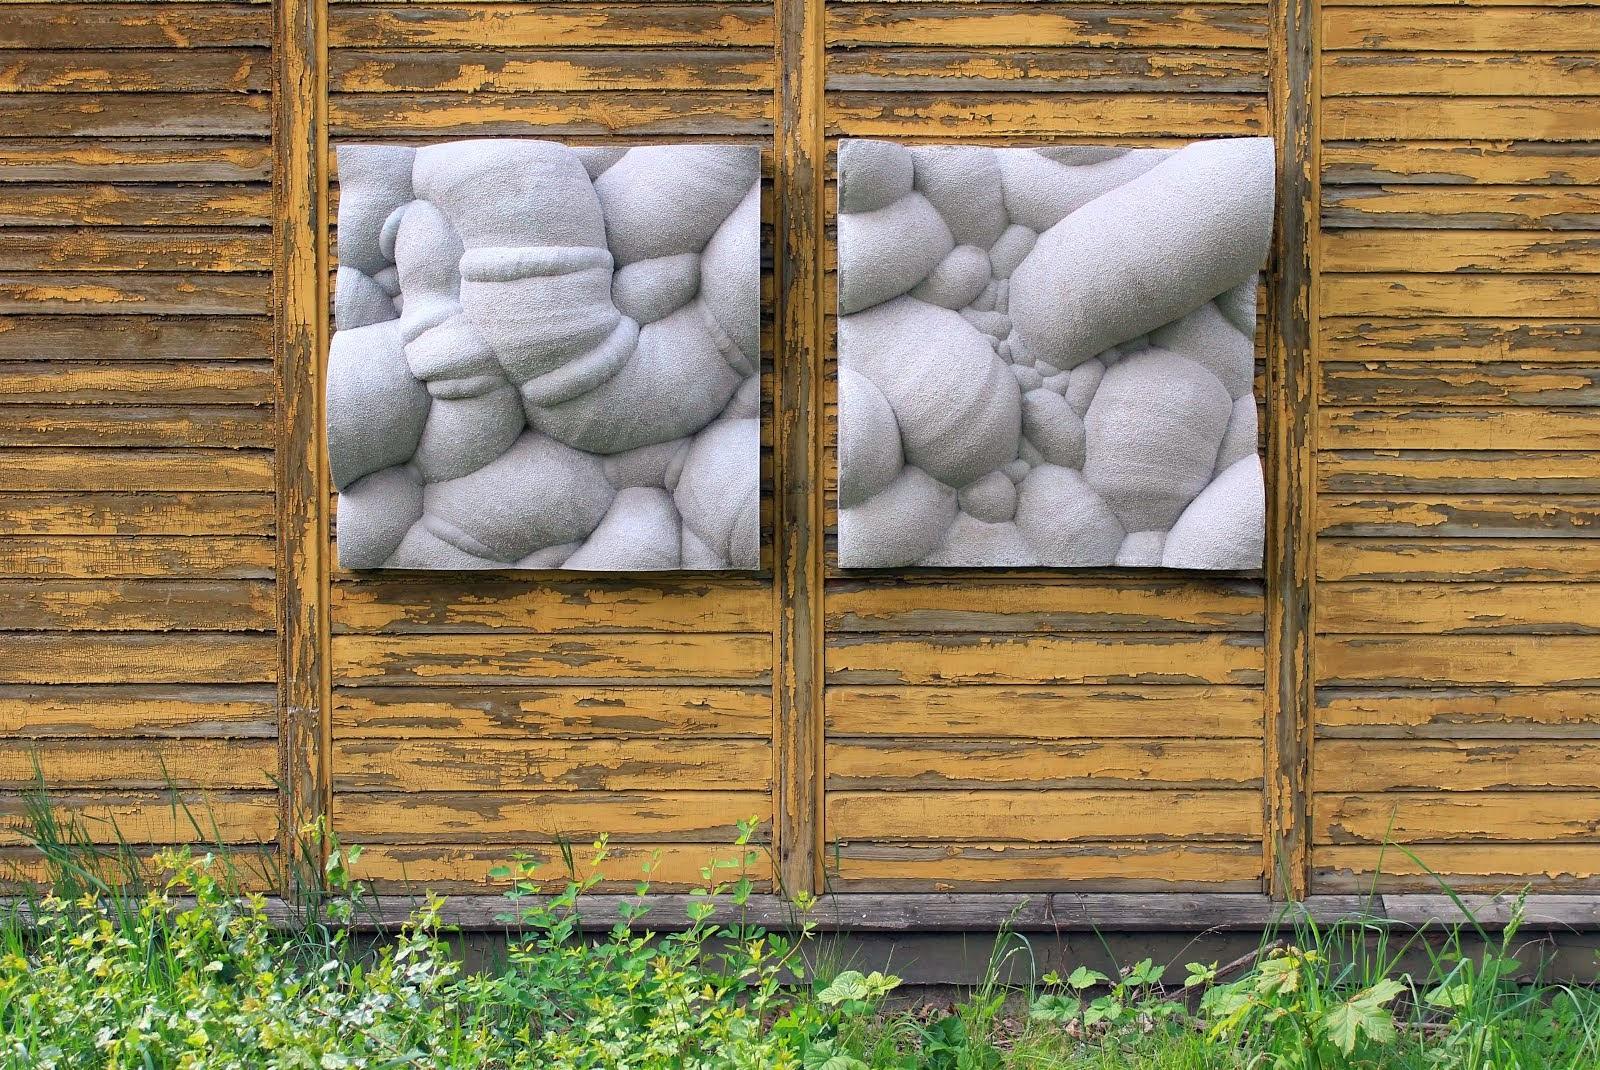 diptych,-2014,-100x100x35cm-kus,-laminát